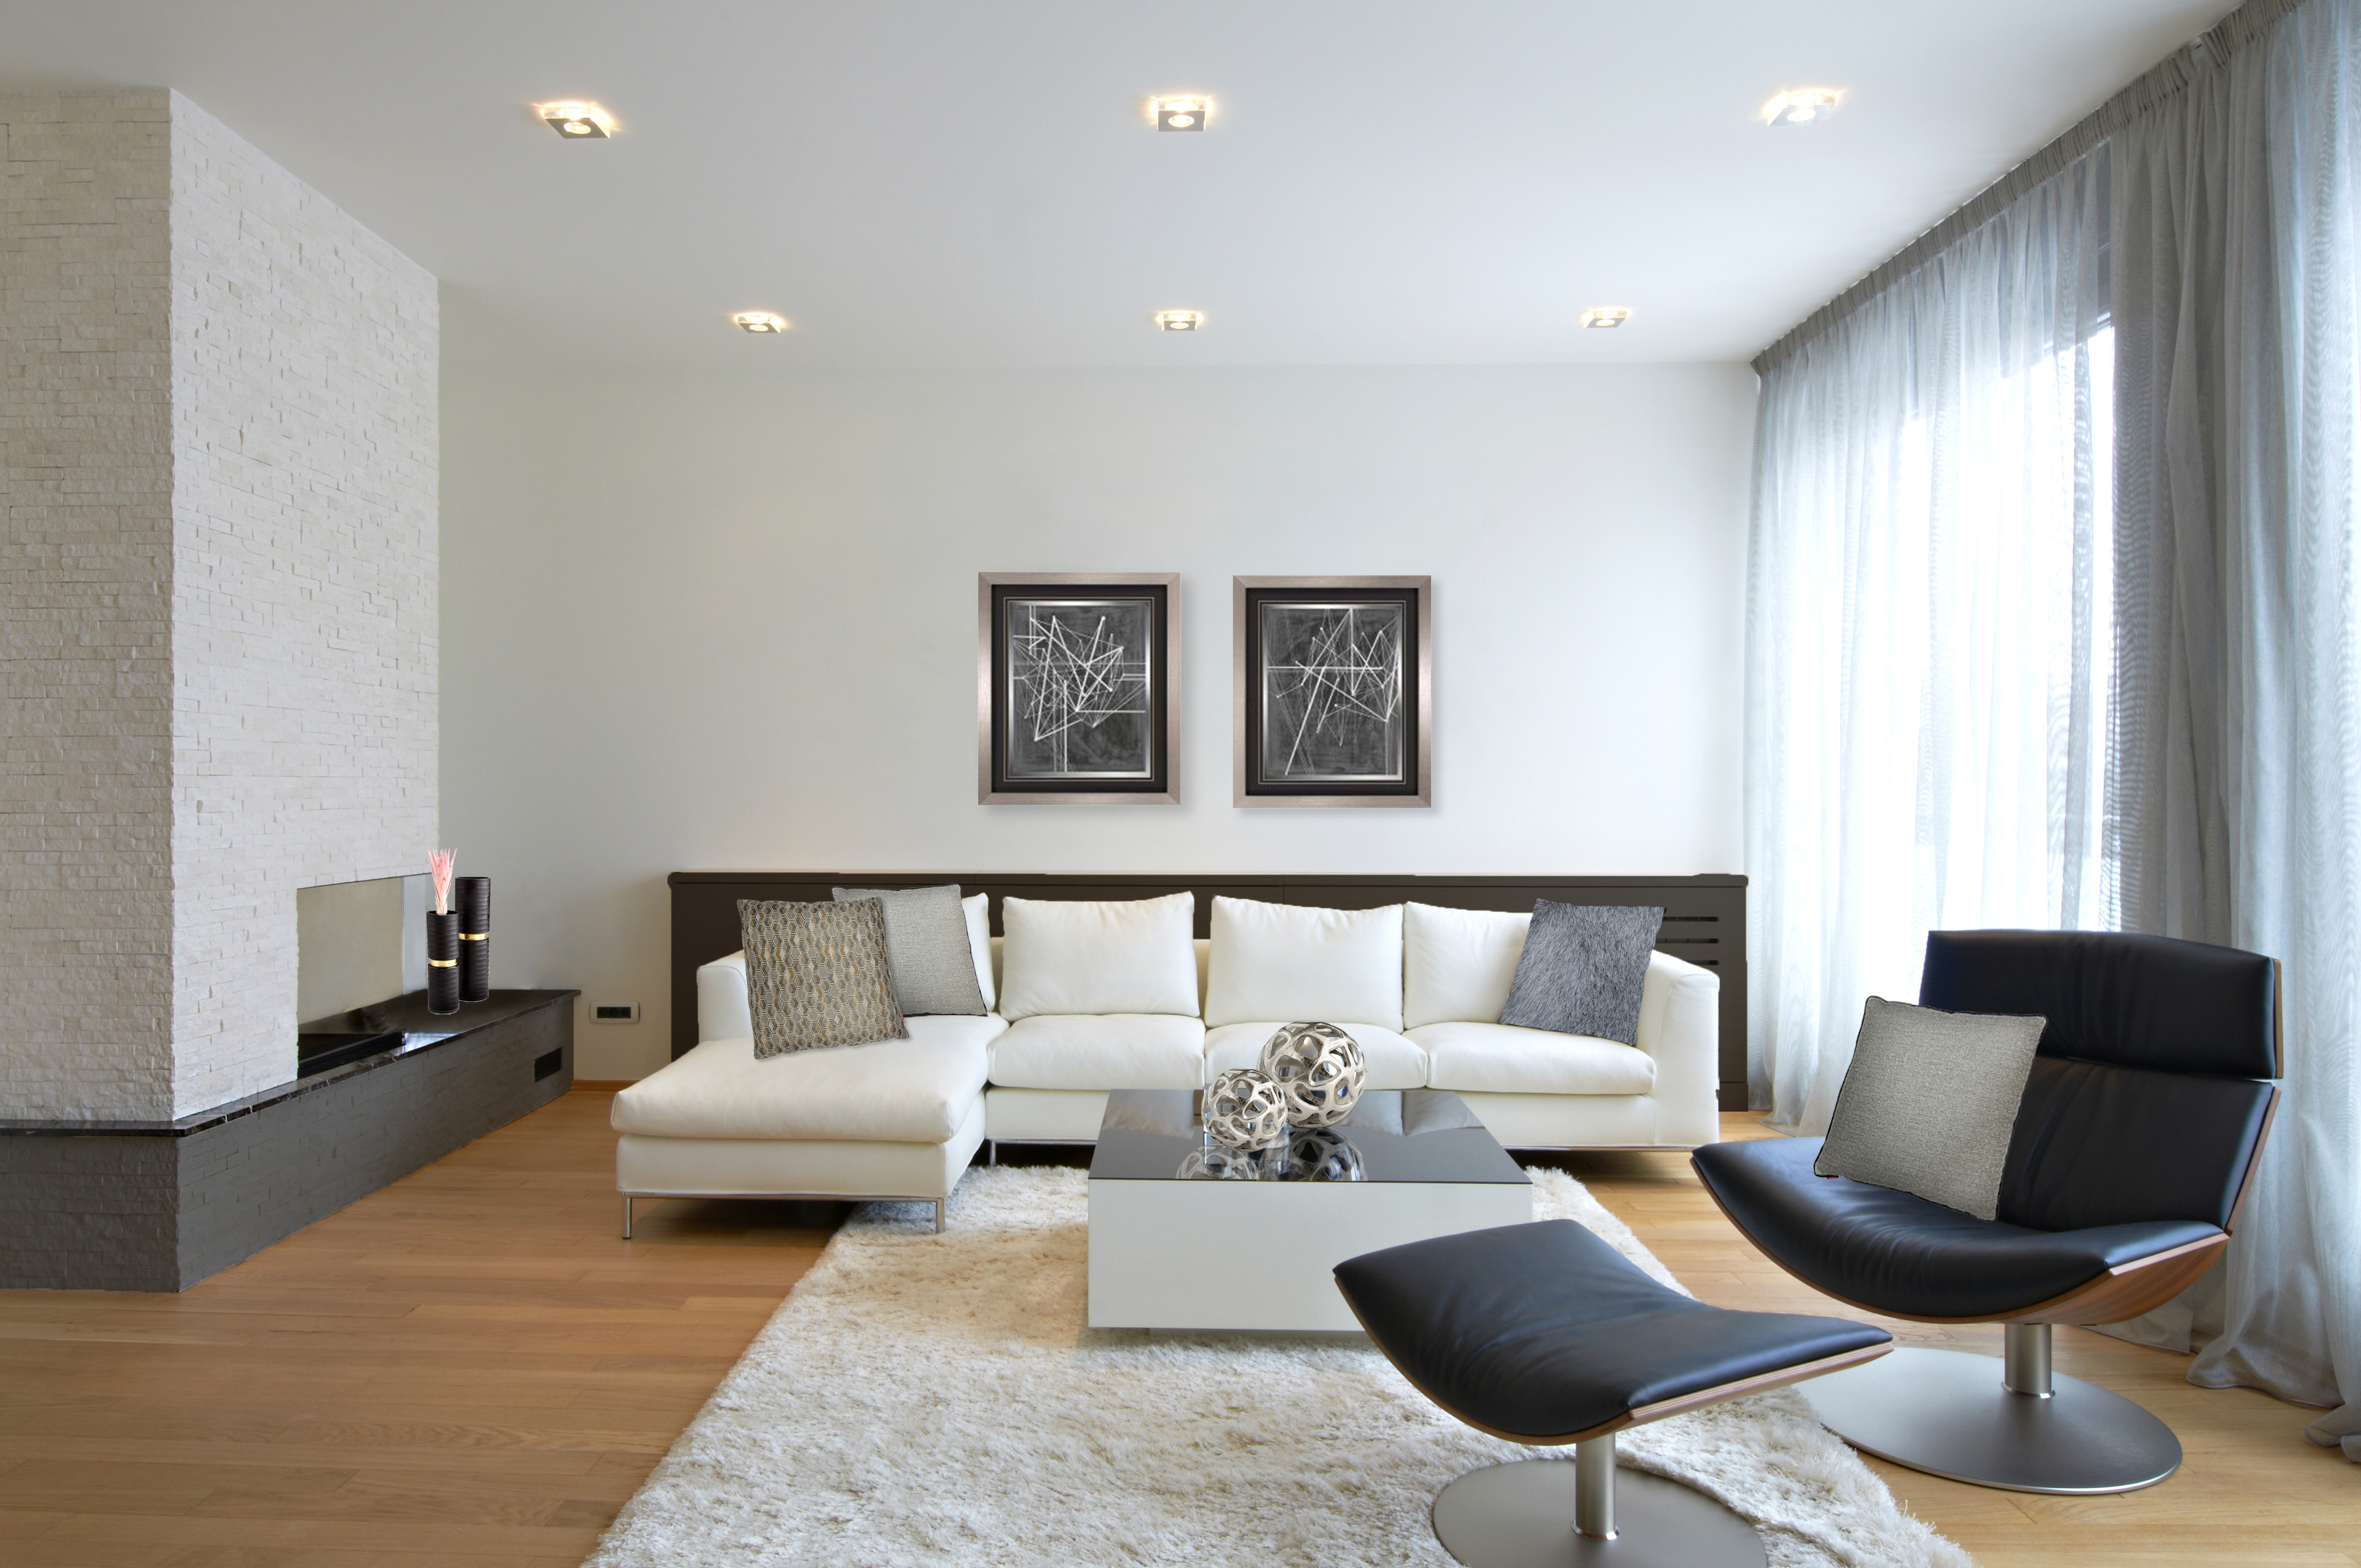 UL0401: Urban Loft Paint Palette | In-Site Interior Design